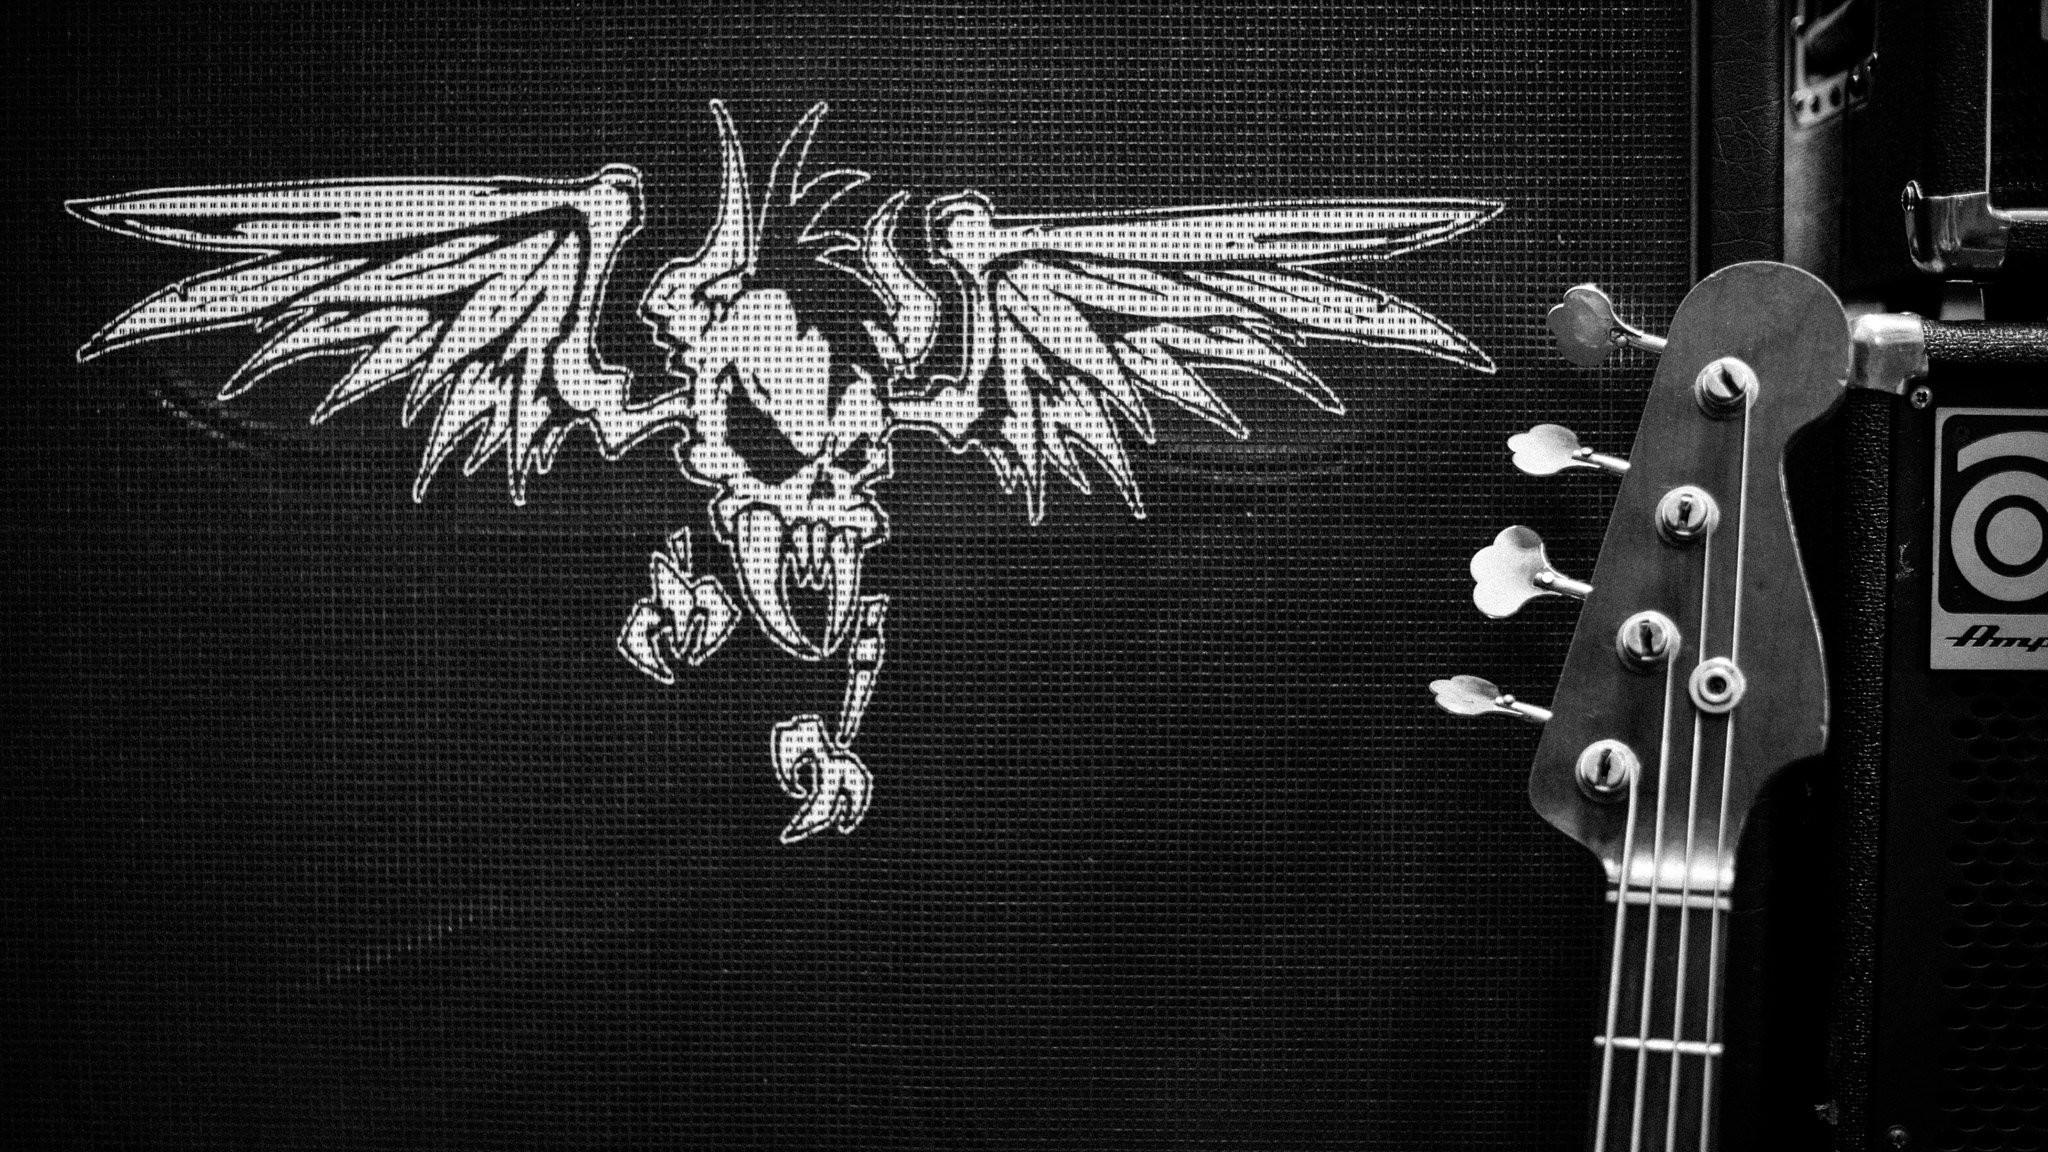 Res: 2048x1152, METALLICA thrash metal heavy rock poster guitar wallpaper |  |  737615 | WallpaperUP